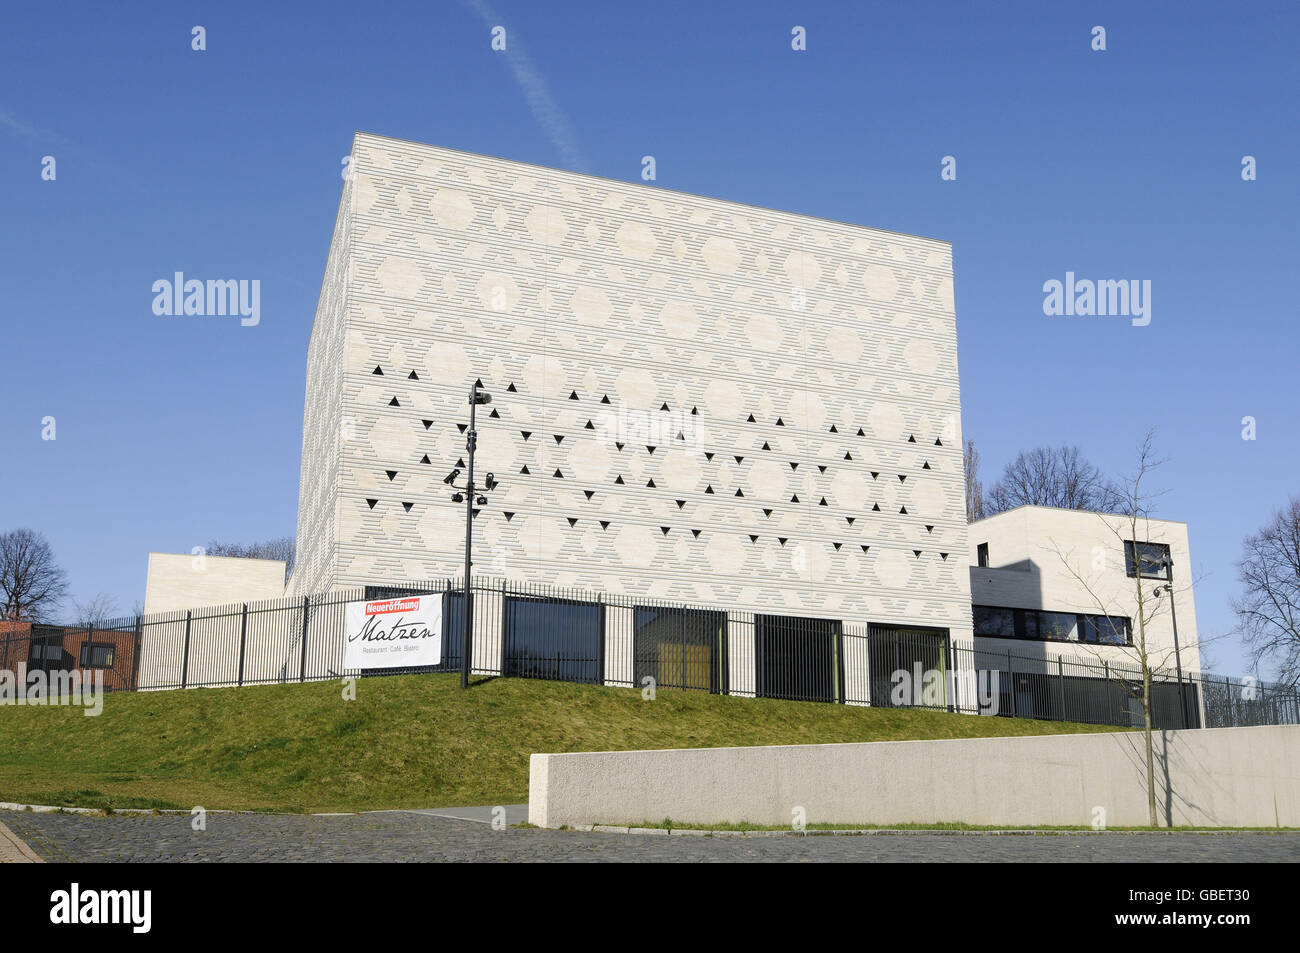 Synagogue, Bochum, North Rhine-Westphalia, Germany - Stock Image